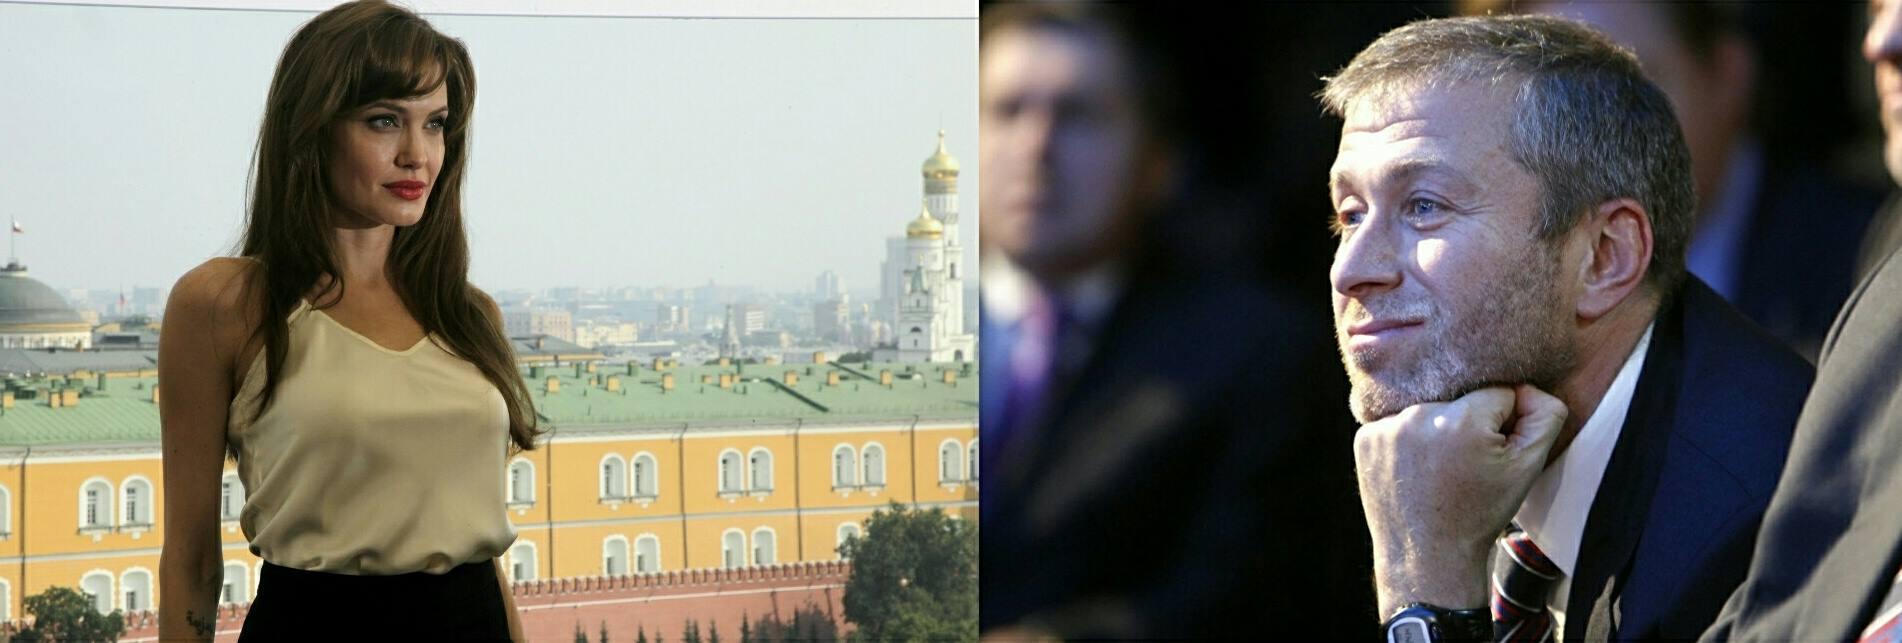 Роман Абрамович и Анджелина Джоли объявили о помолвке